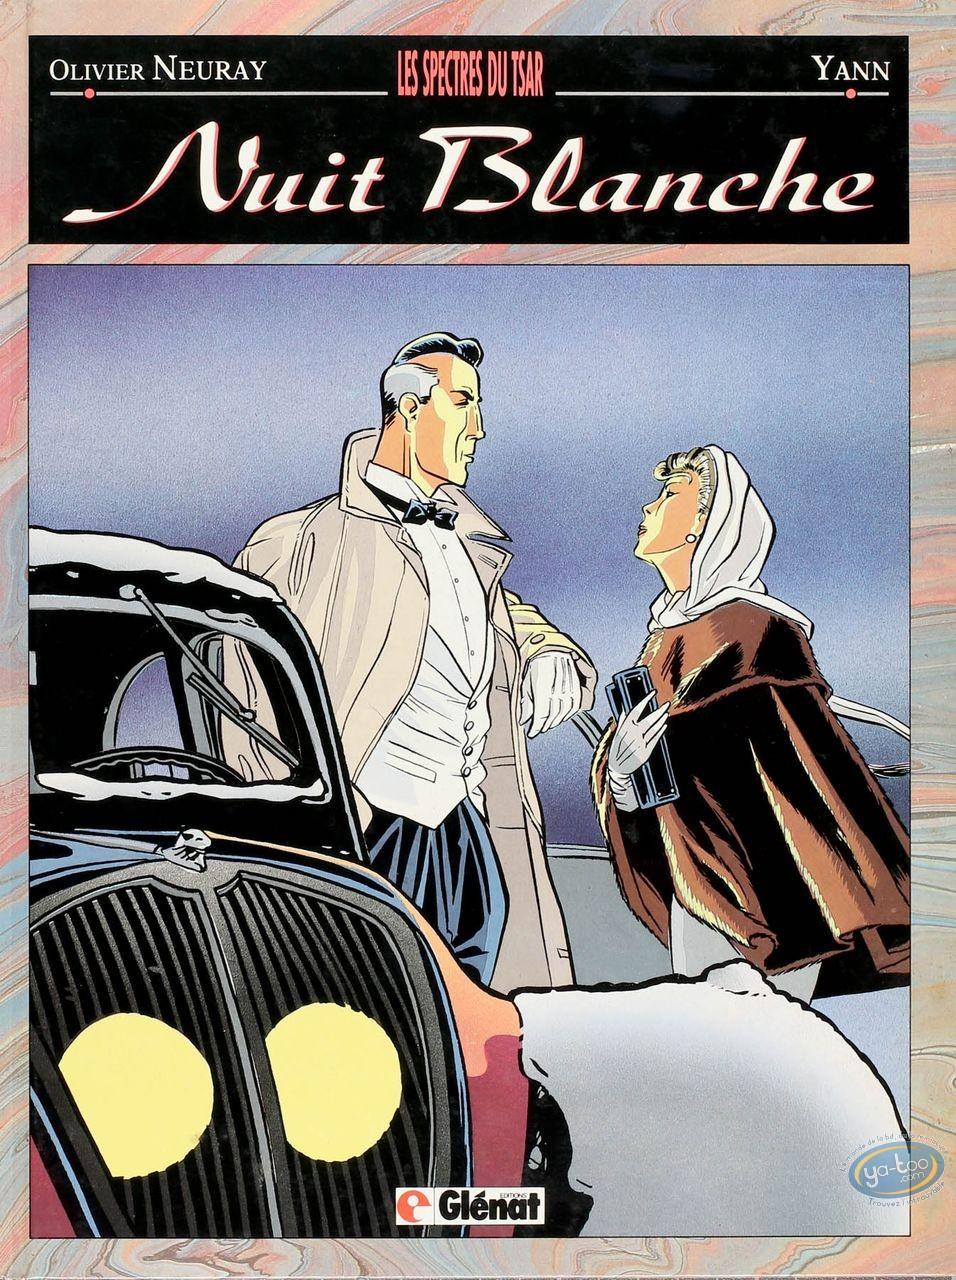 Listed European Comic Books, Nuit Blanche : Les Spectres du Tsar (+ bookplate)